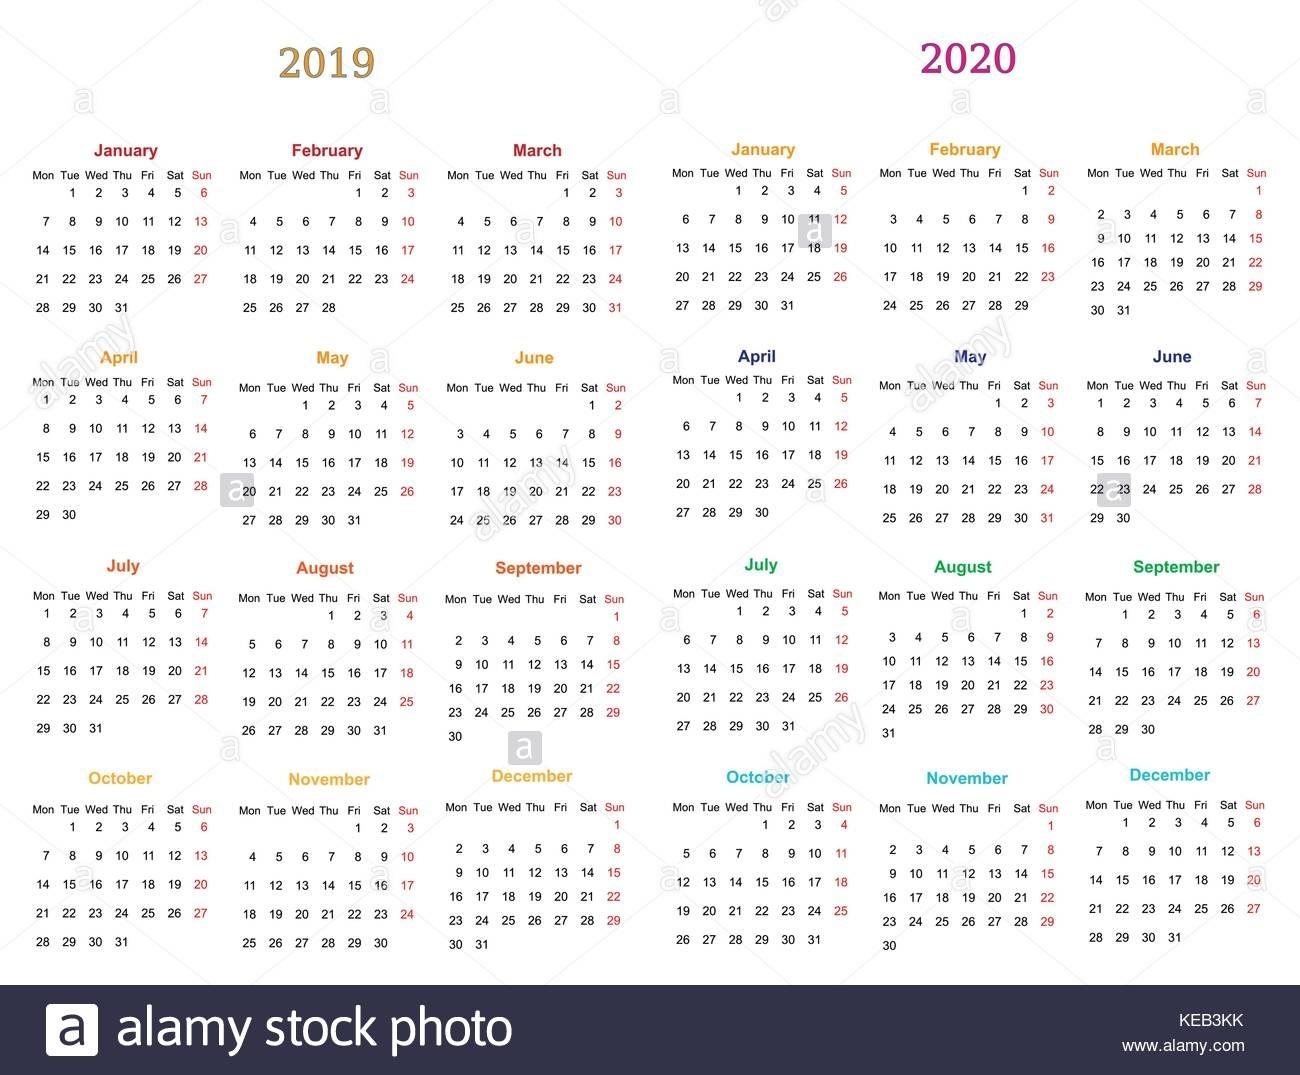 Calendar 2020 Stock Vector Images - Alamy  Printable Neon 12 Month Blank Calendar